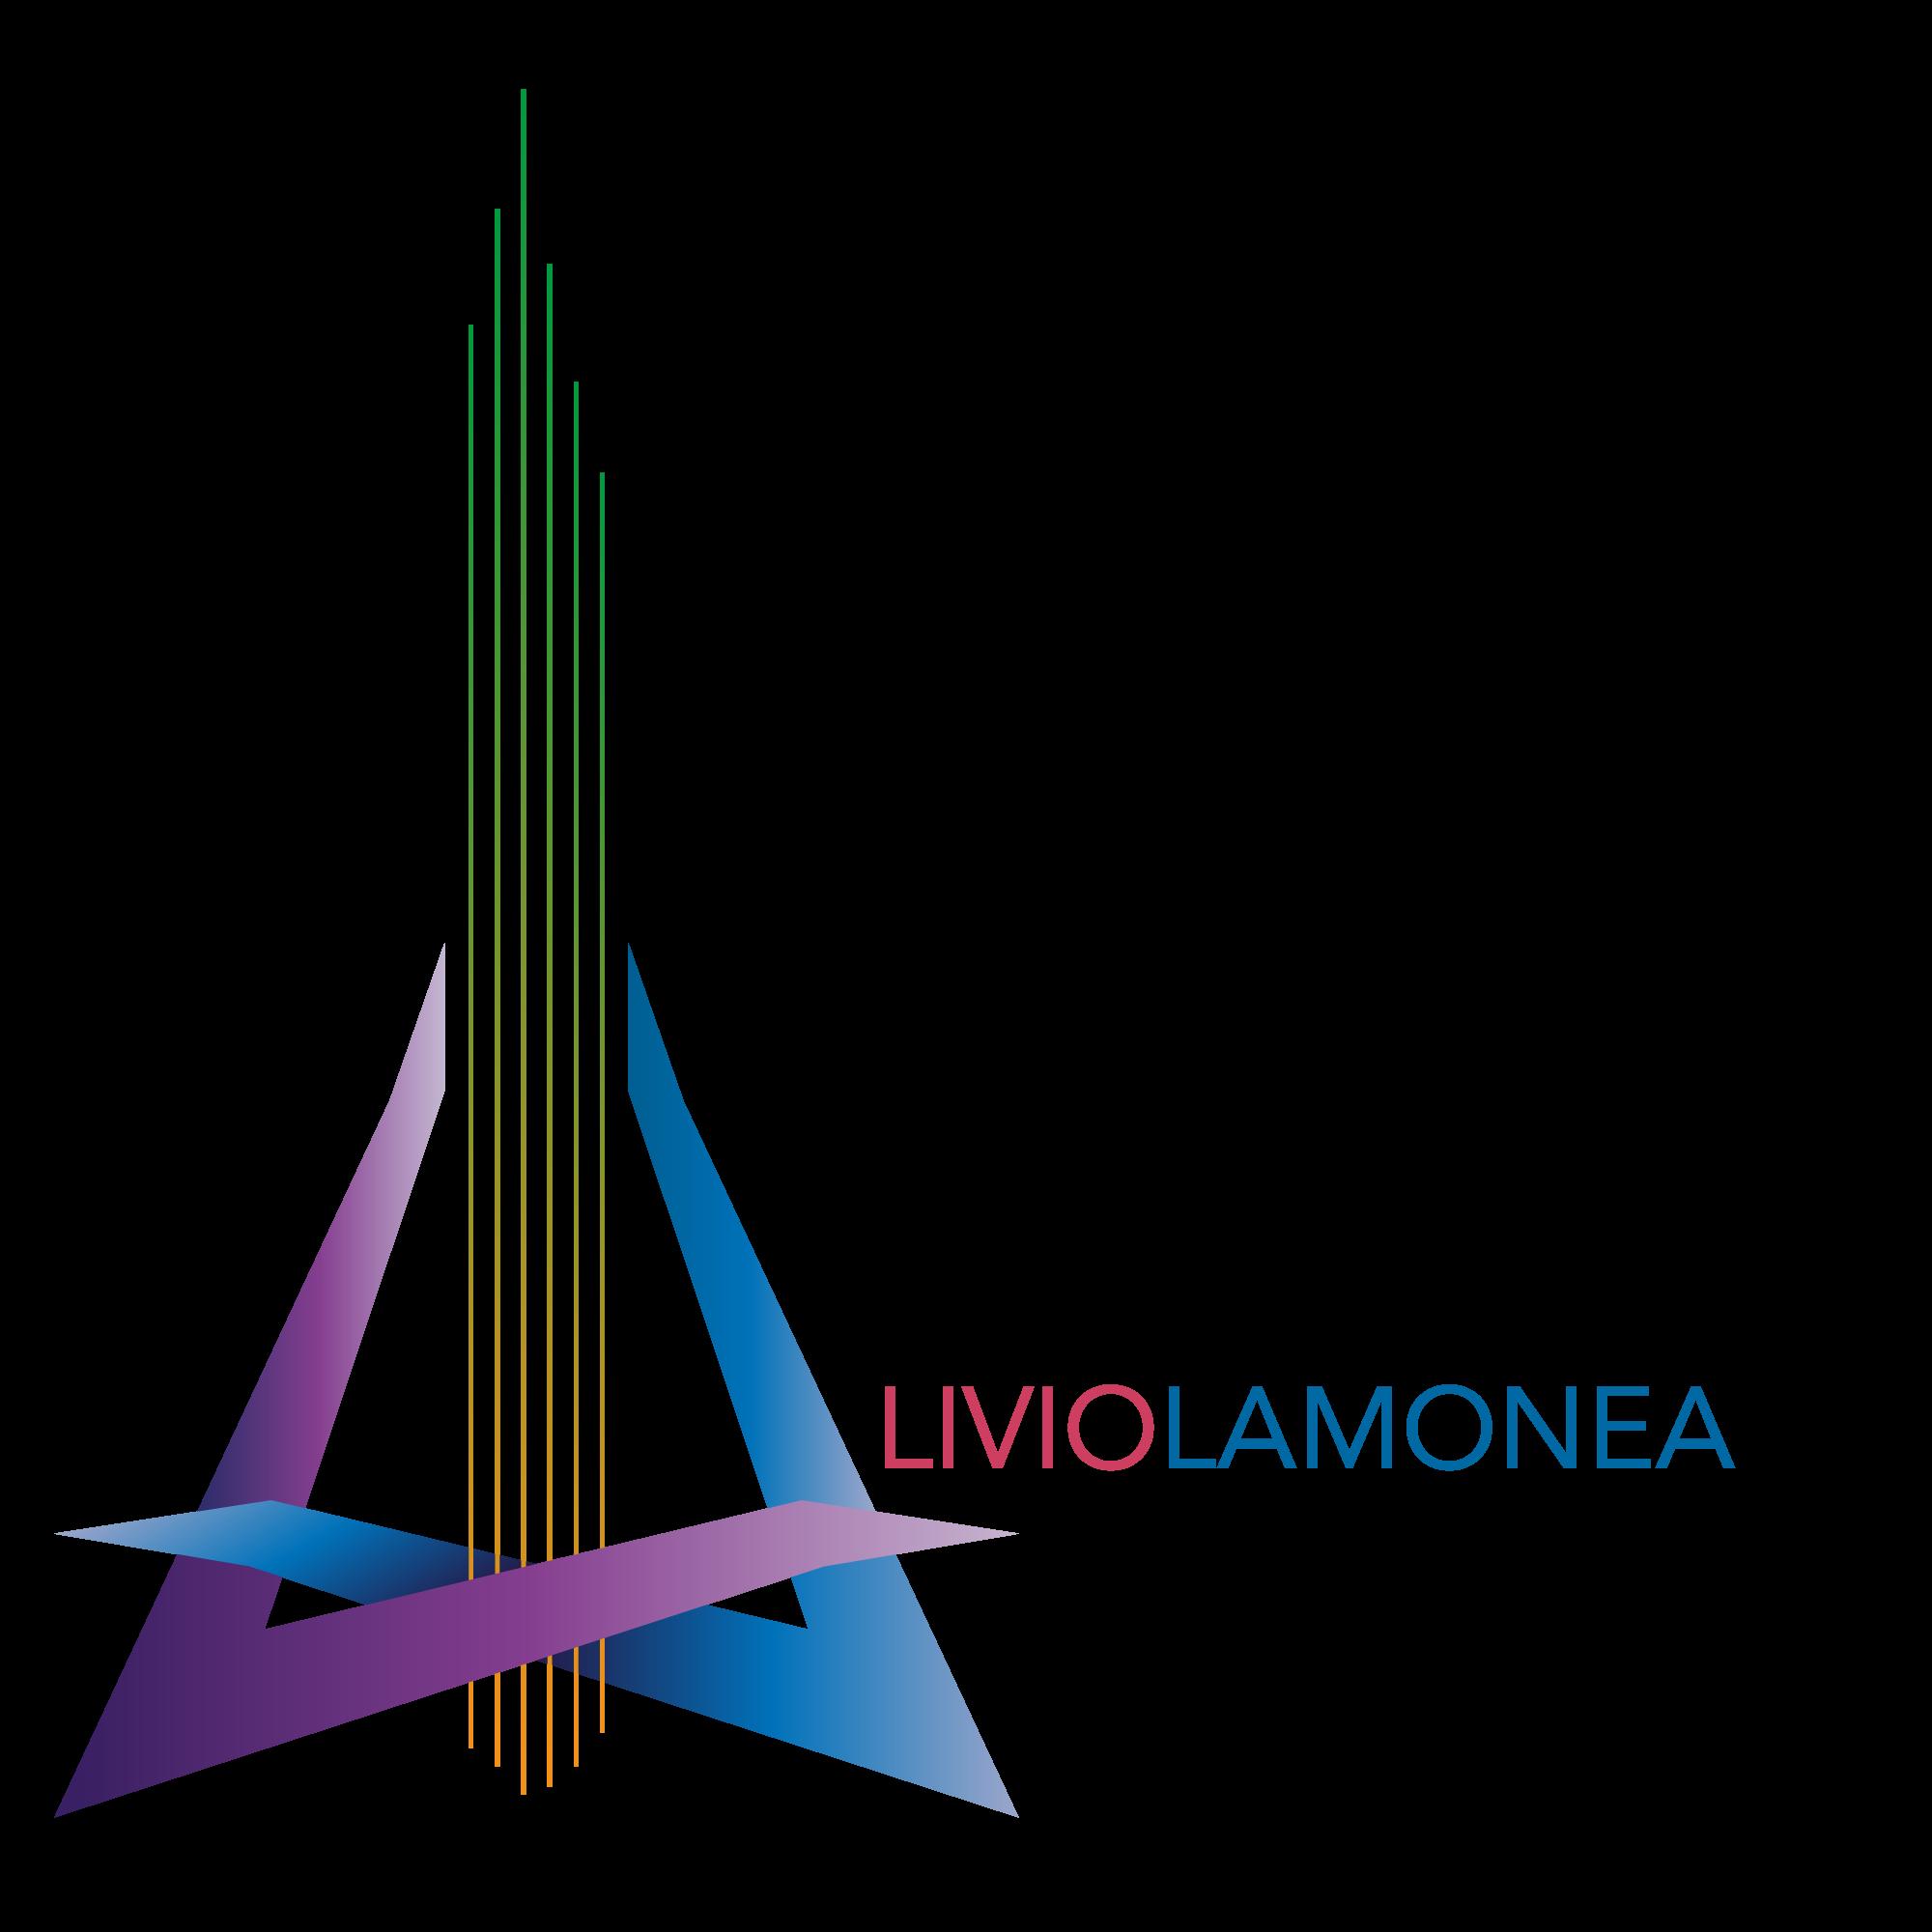 Liviolamonea.it